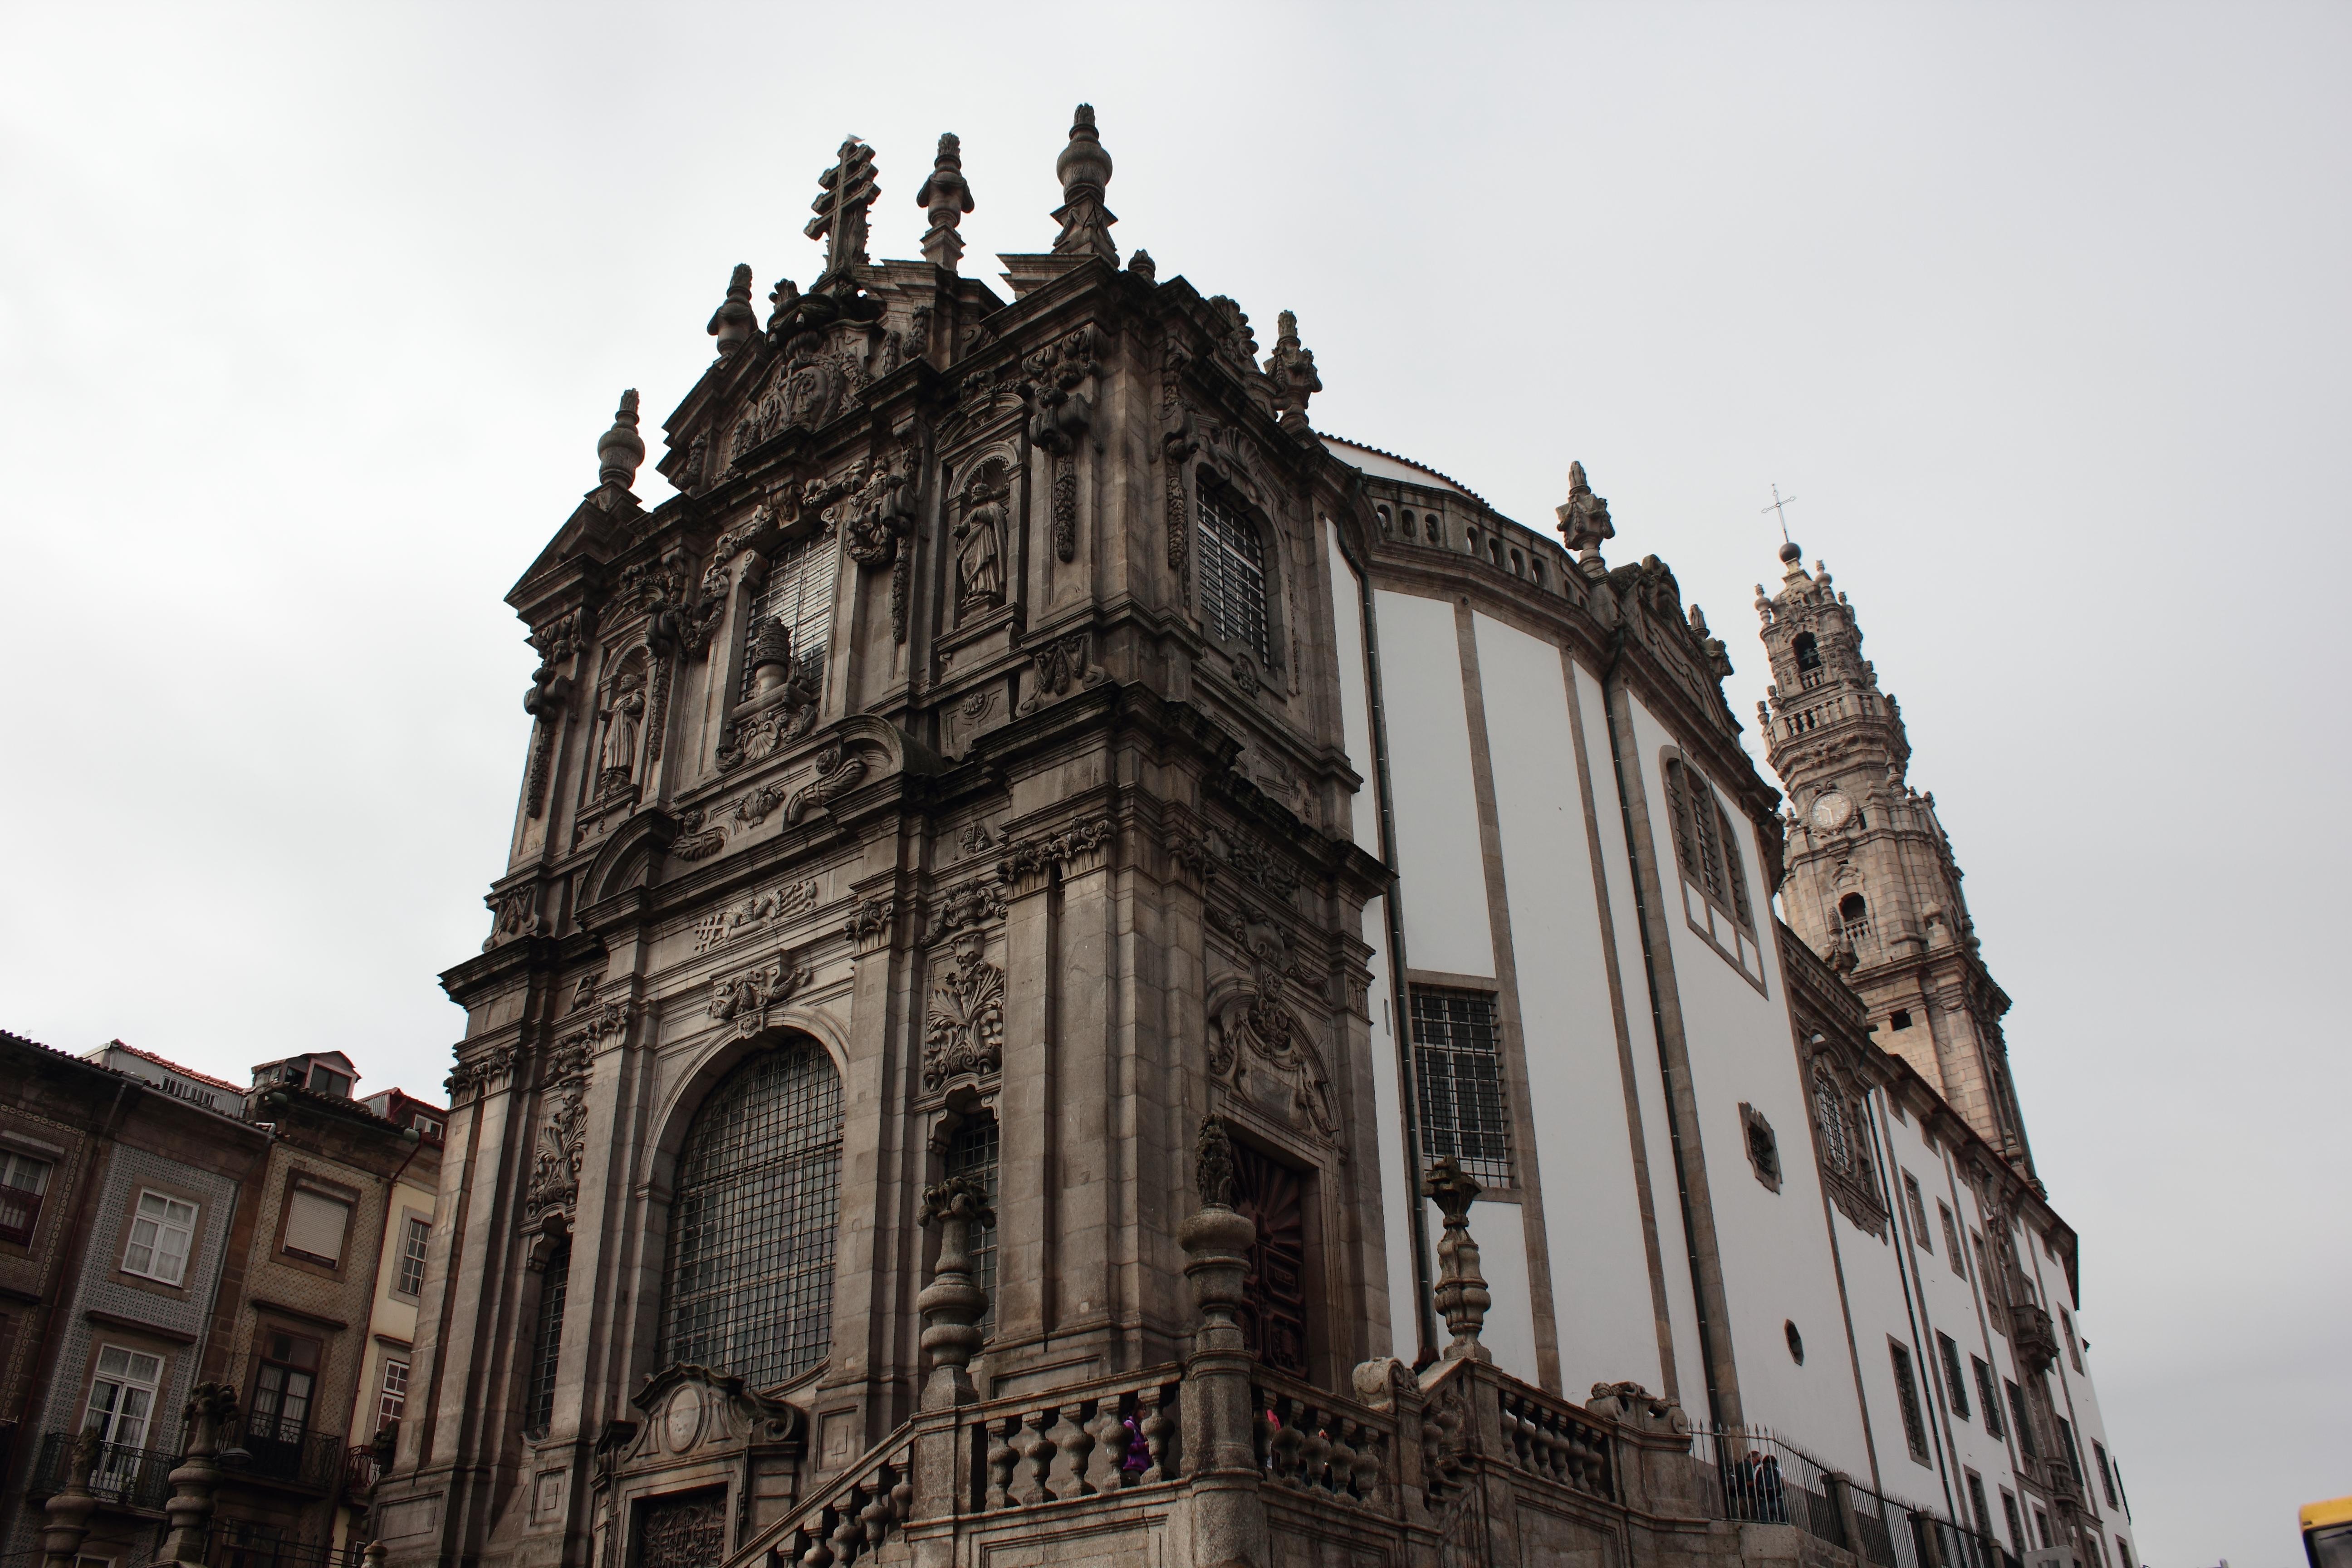 Igreja dos Clerigos